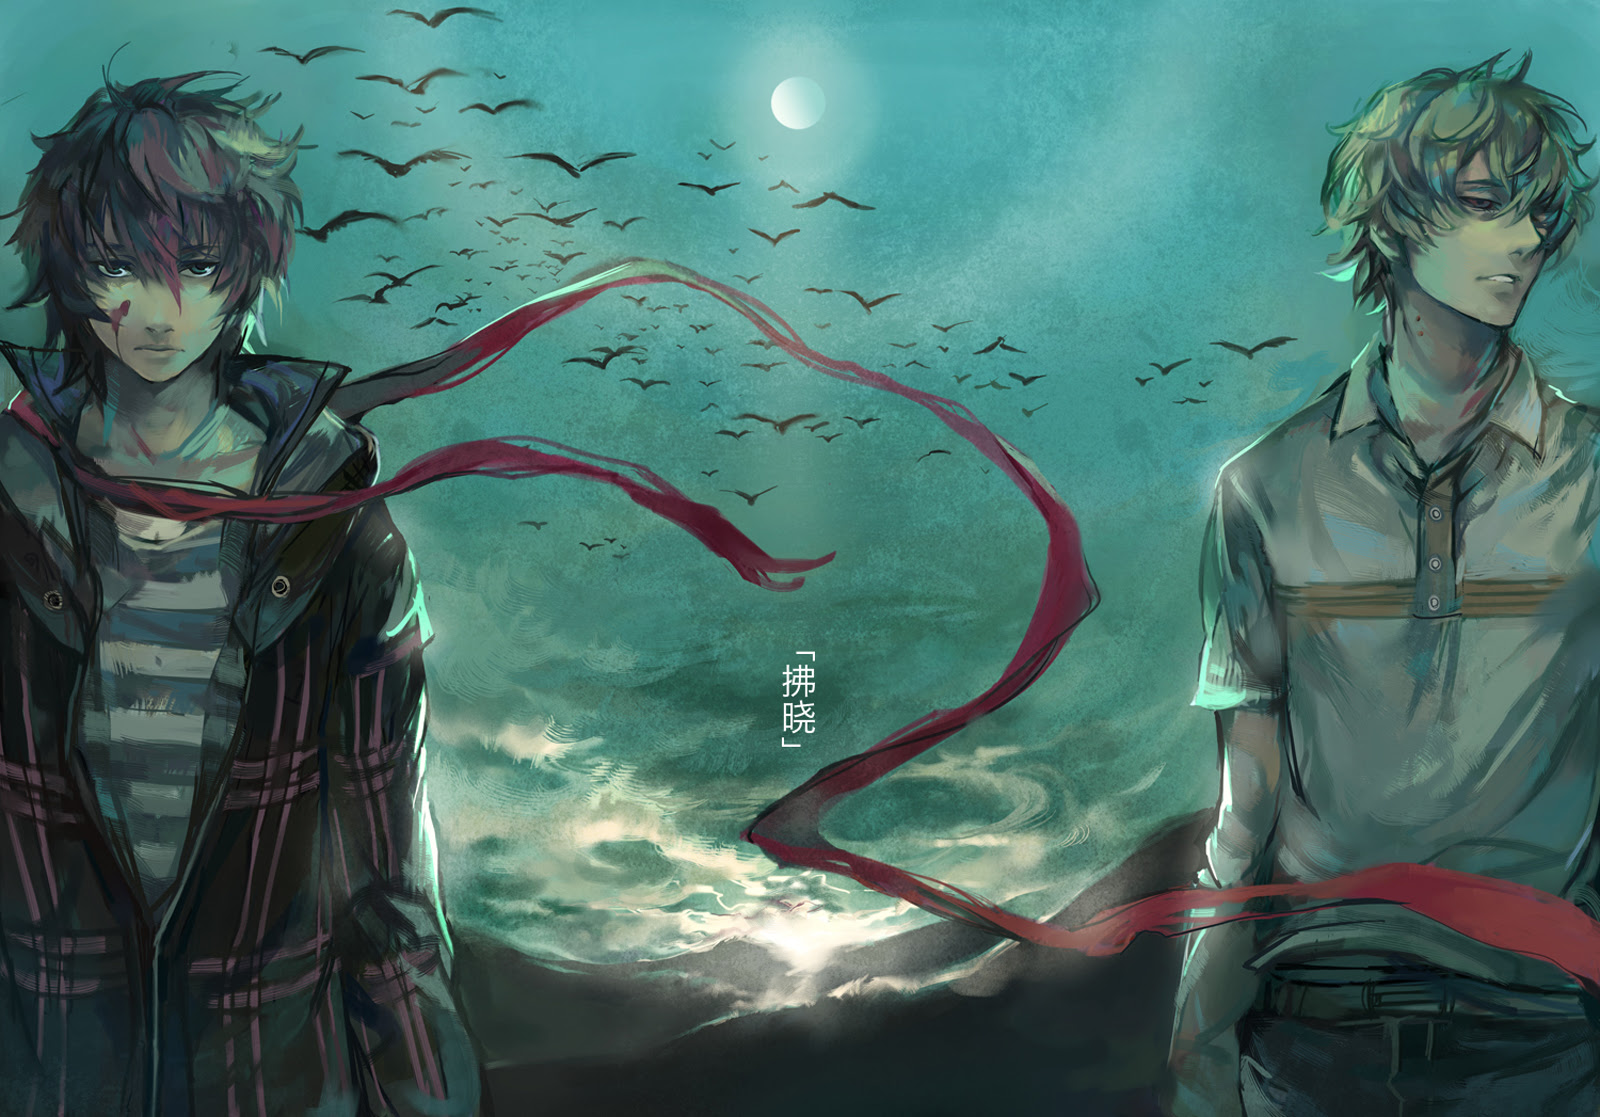 Anime Guy Wallpaper HD - WallpaperSafari